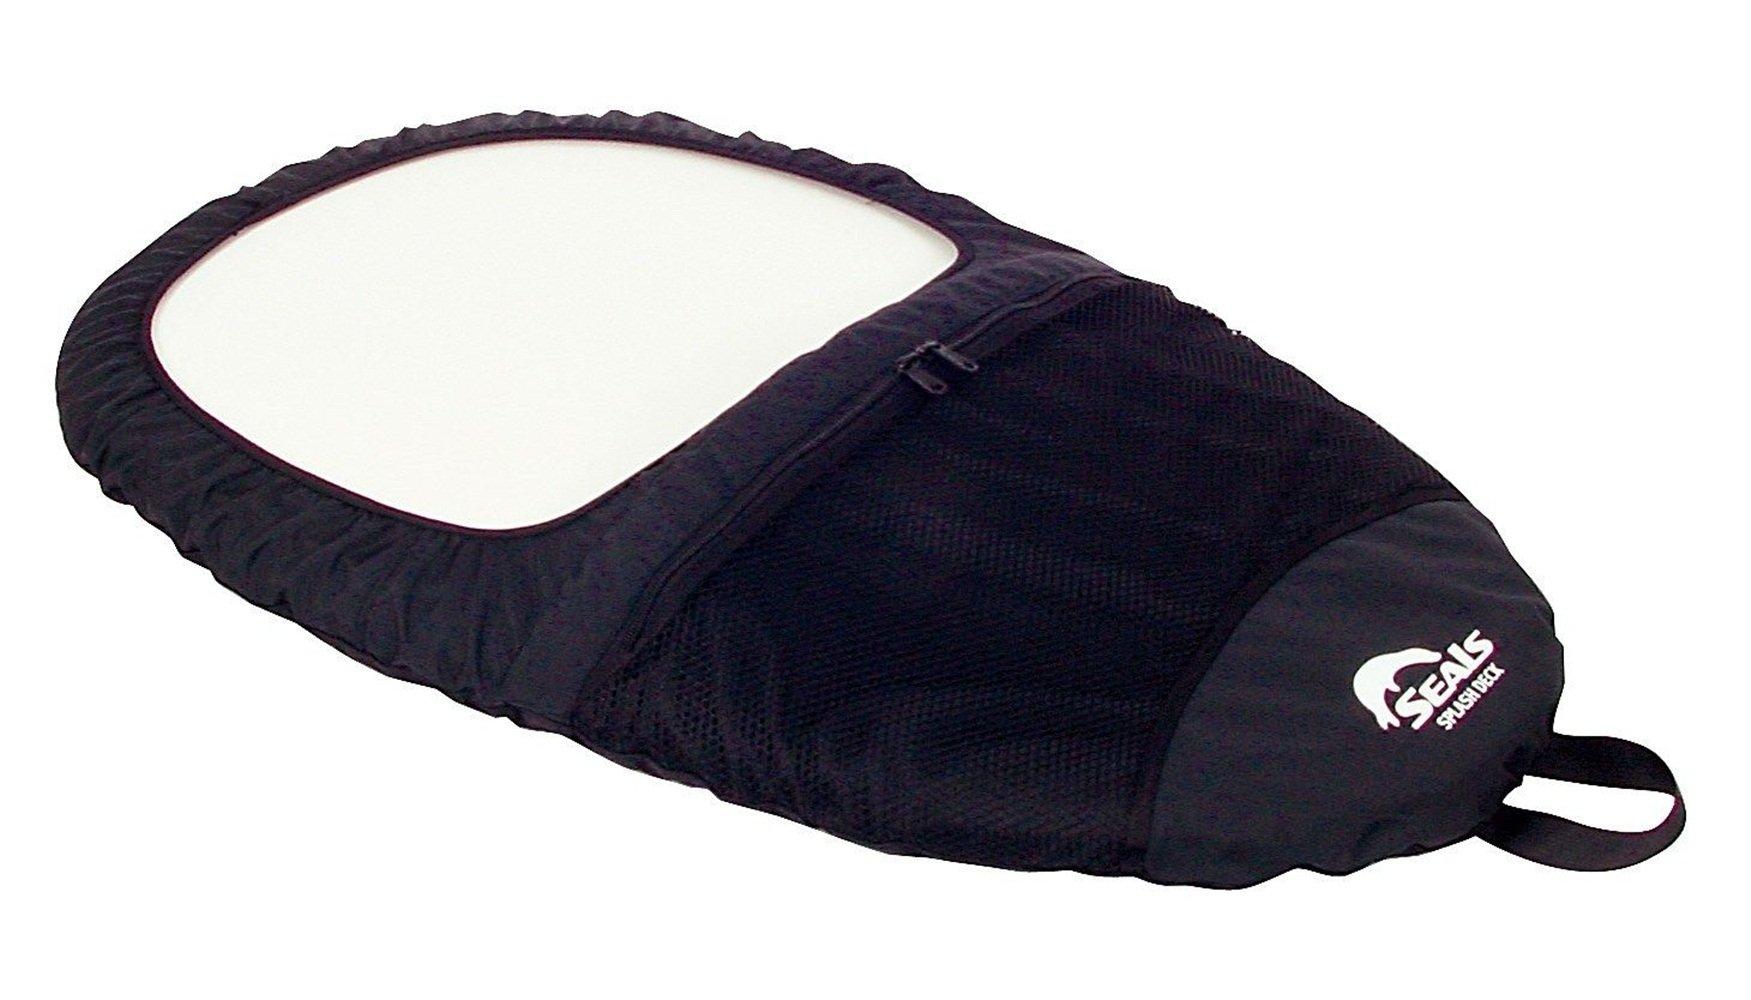 Kayak Spray Skirt Cover Seals Splash Deck for all Kayaks Accessories Spray Skirt